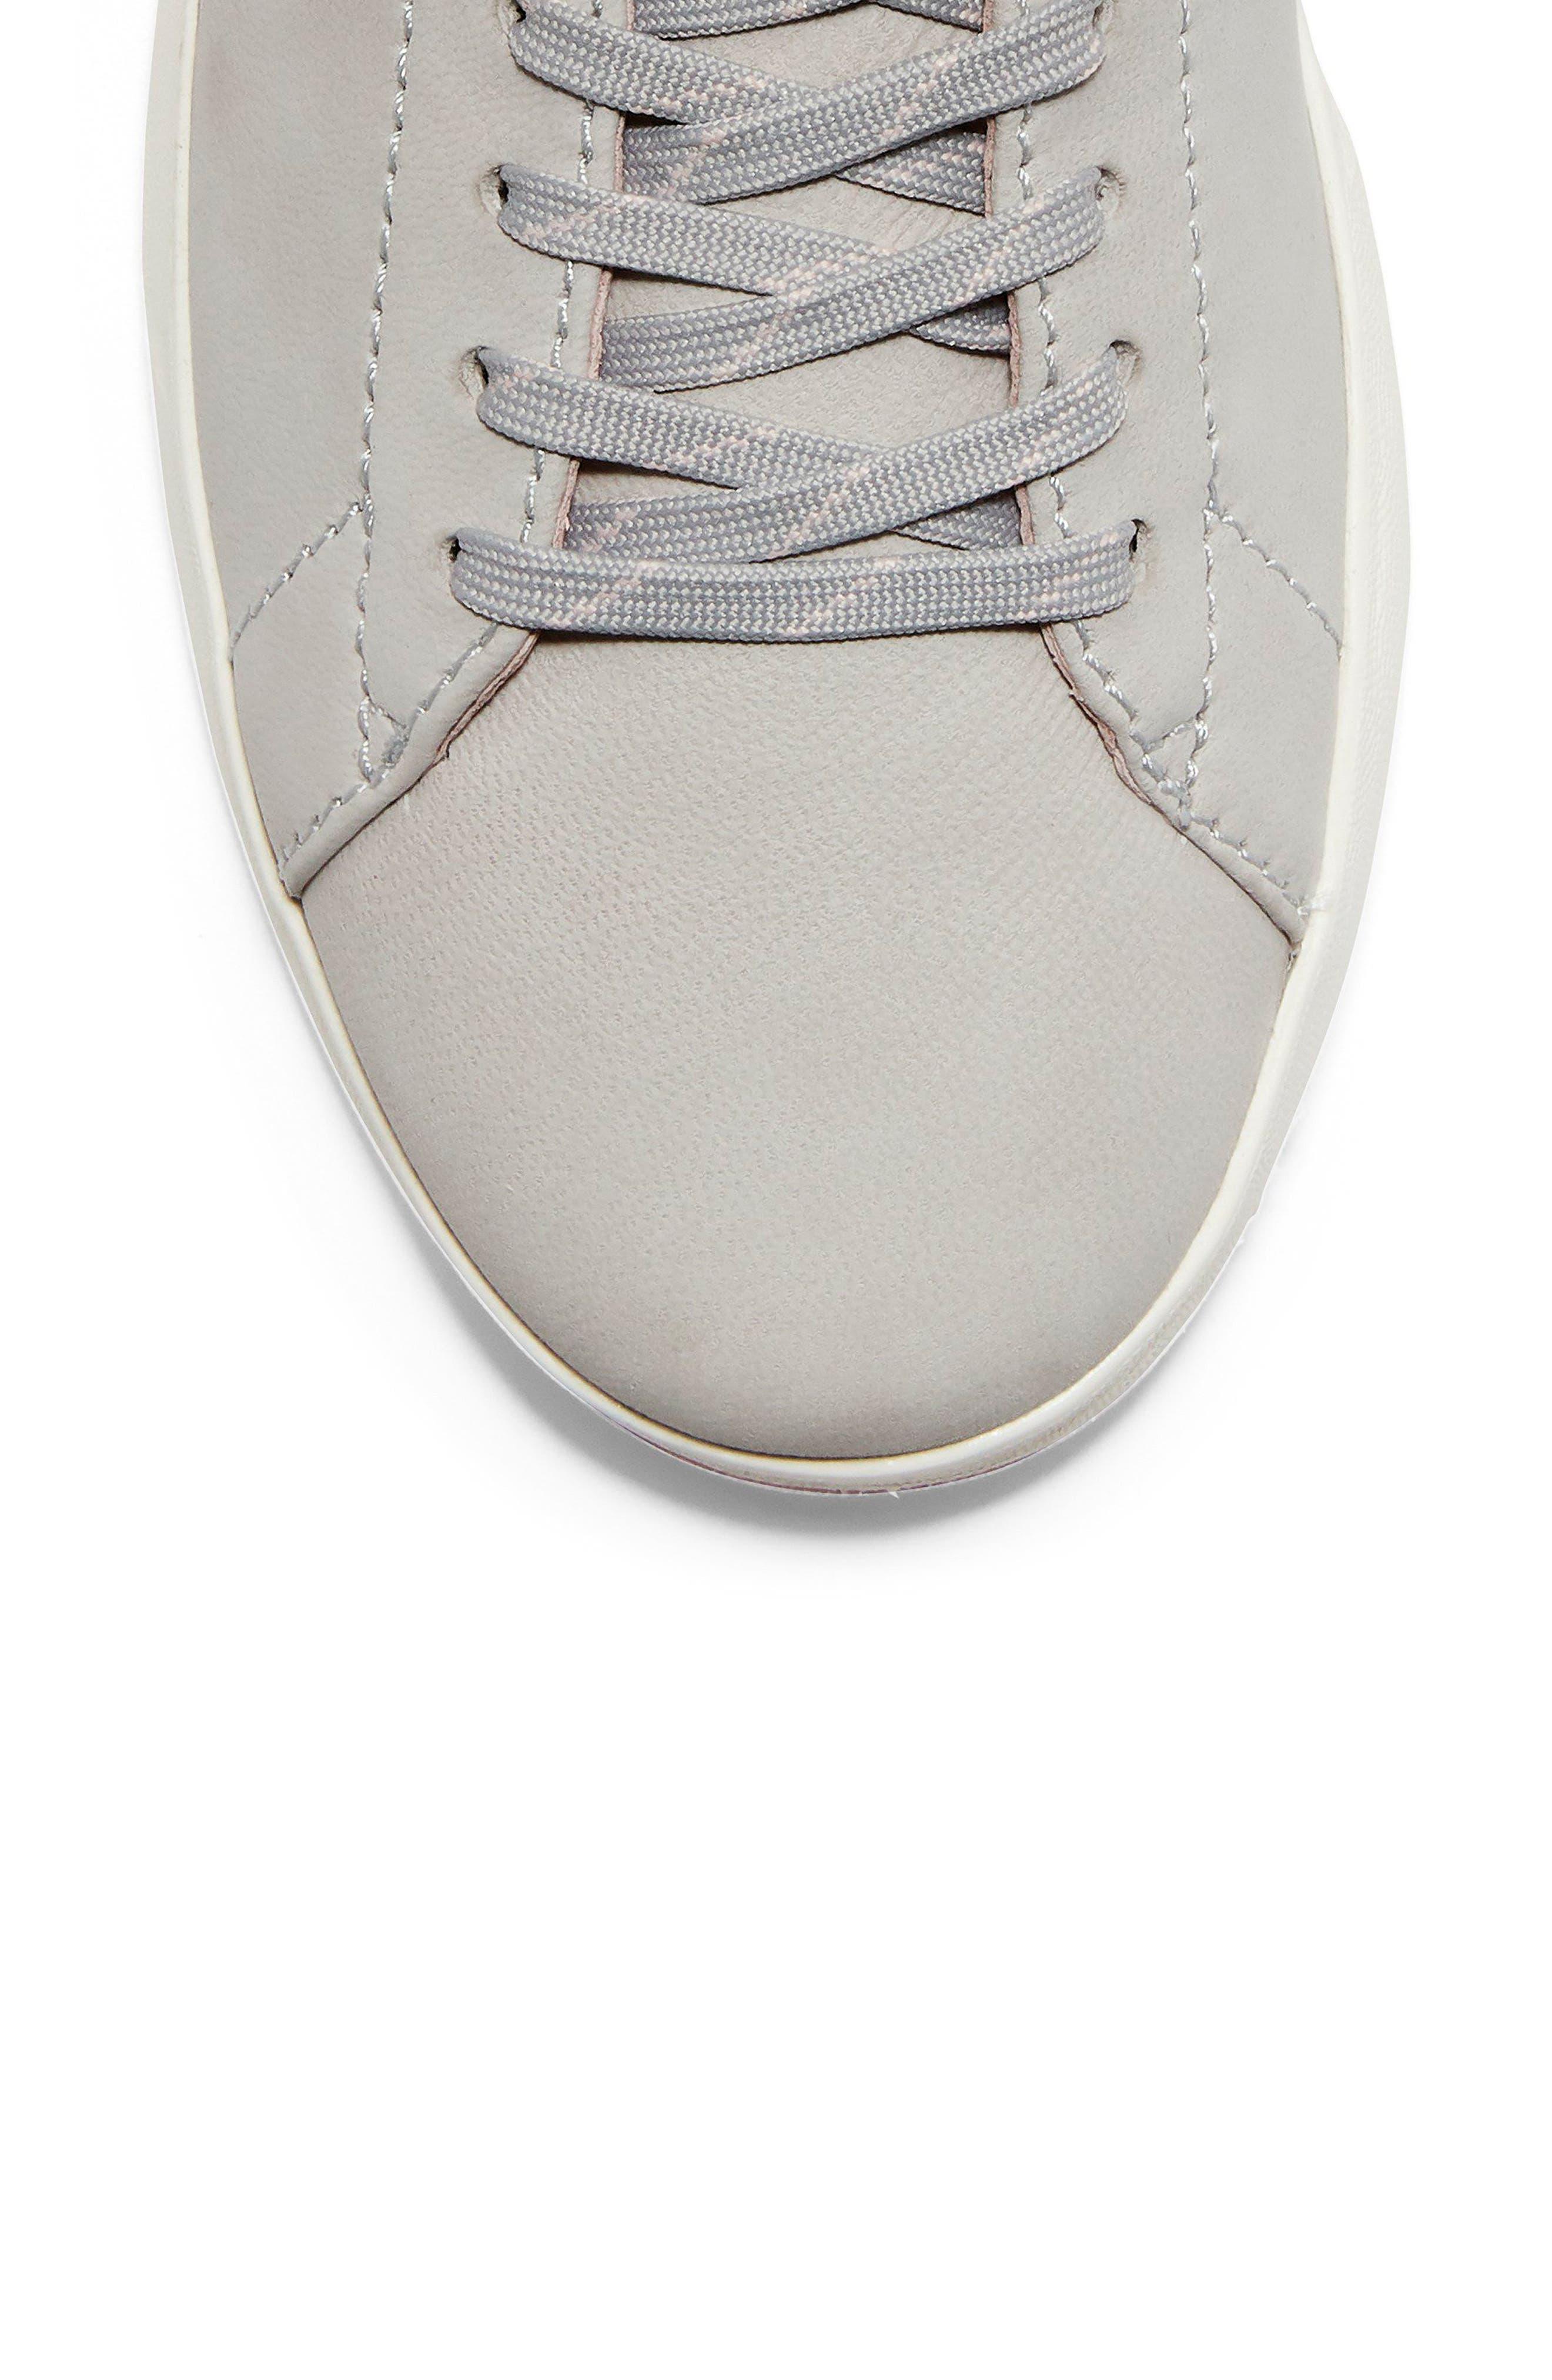 GrandPro Tennis Shoe,                             Alternate thumbnail 10, color,                             Vapor Grey Nubuck